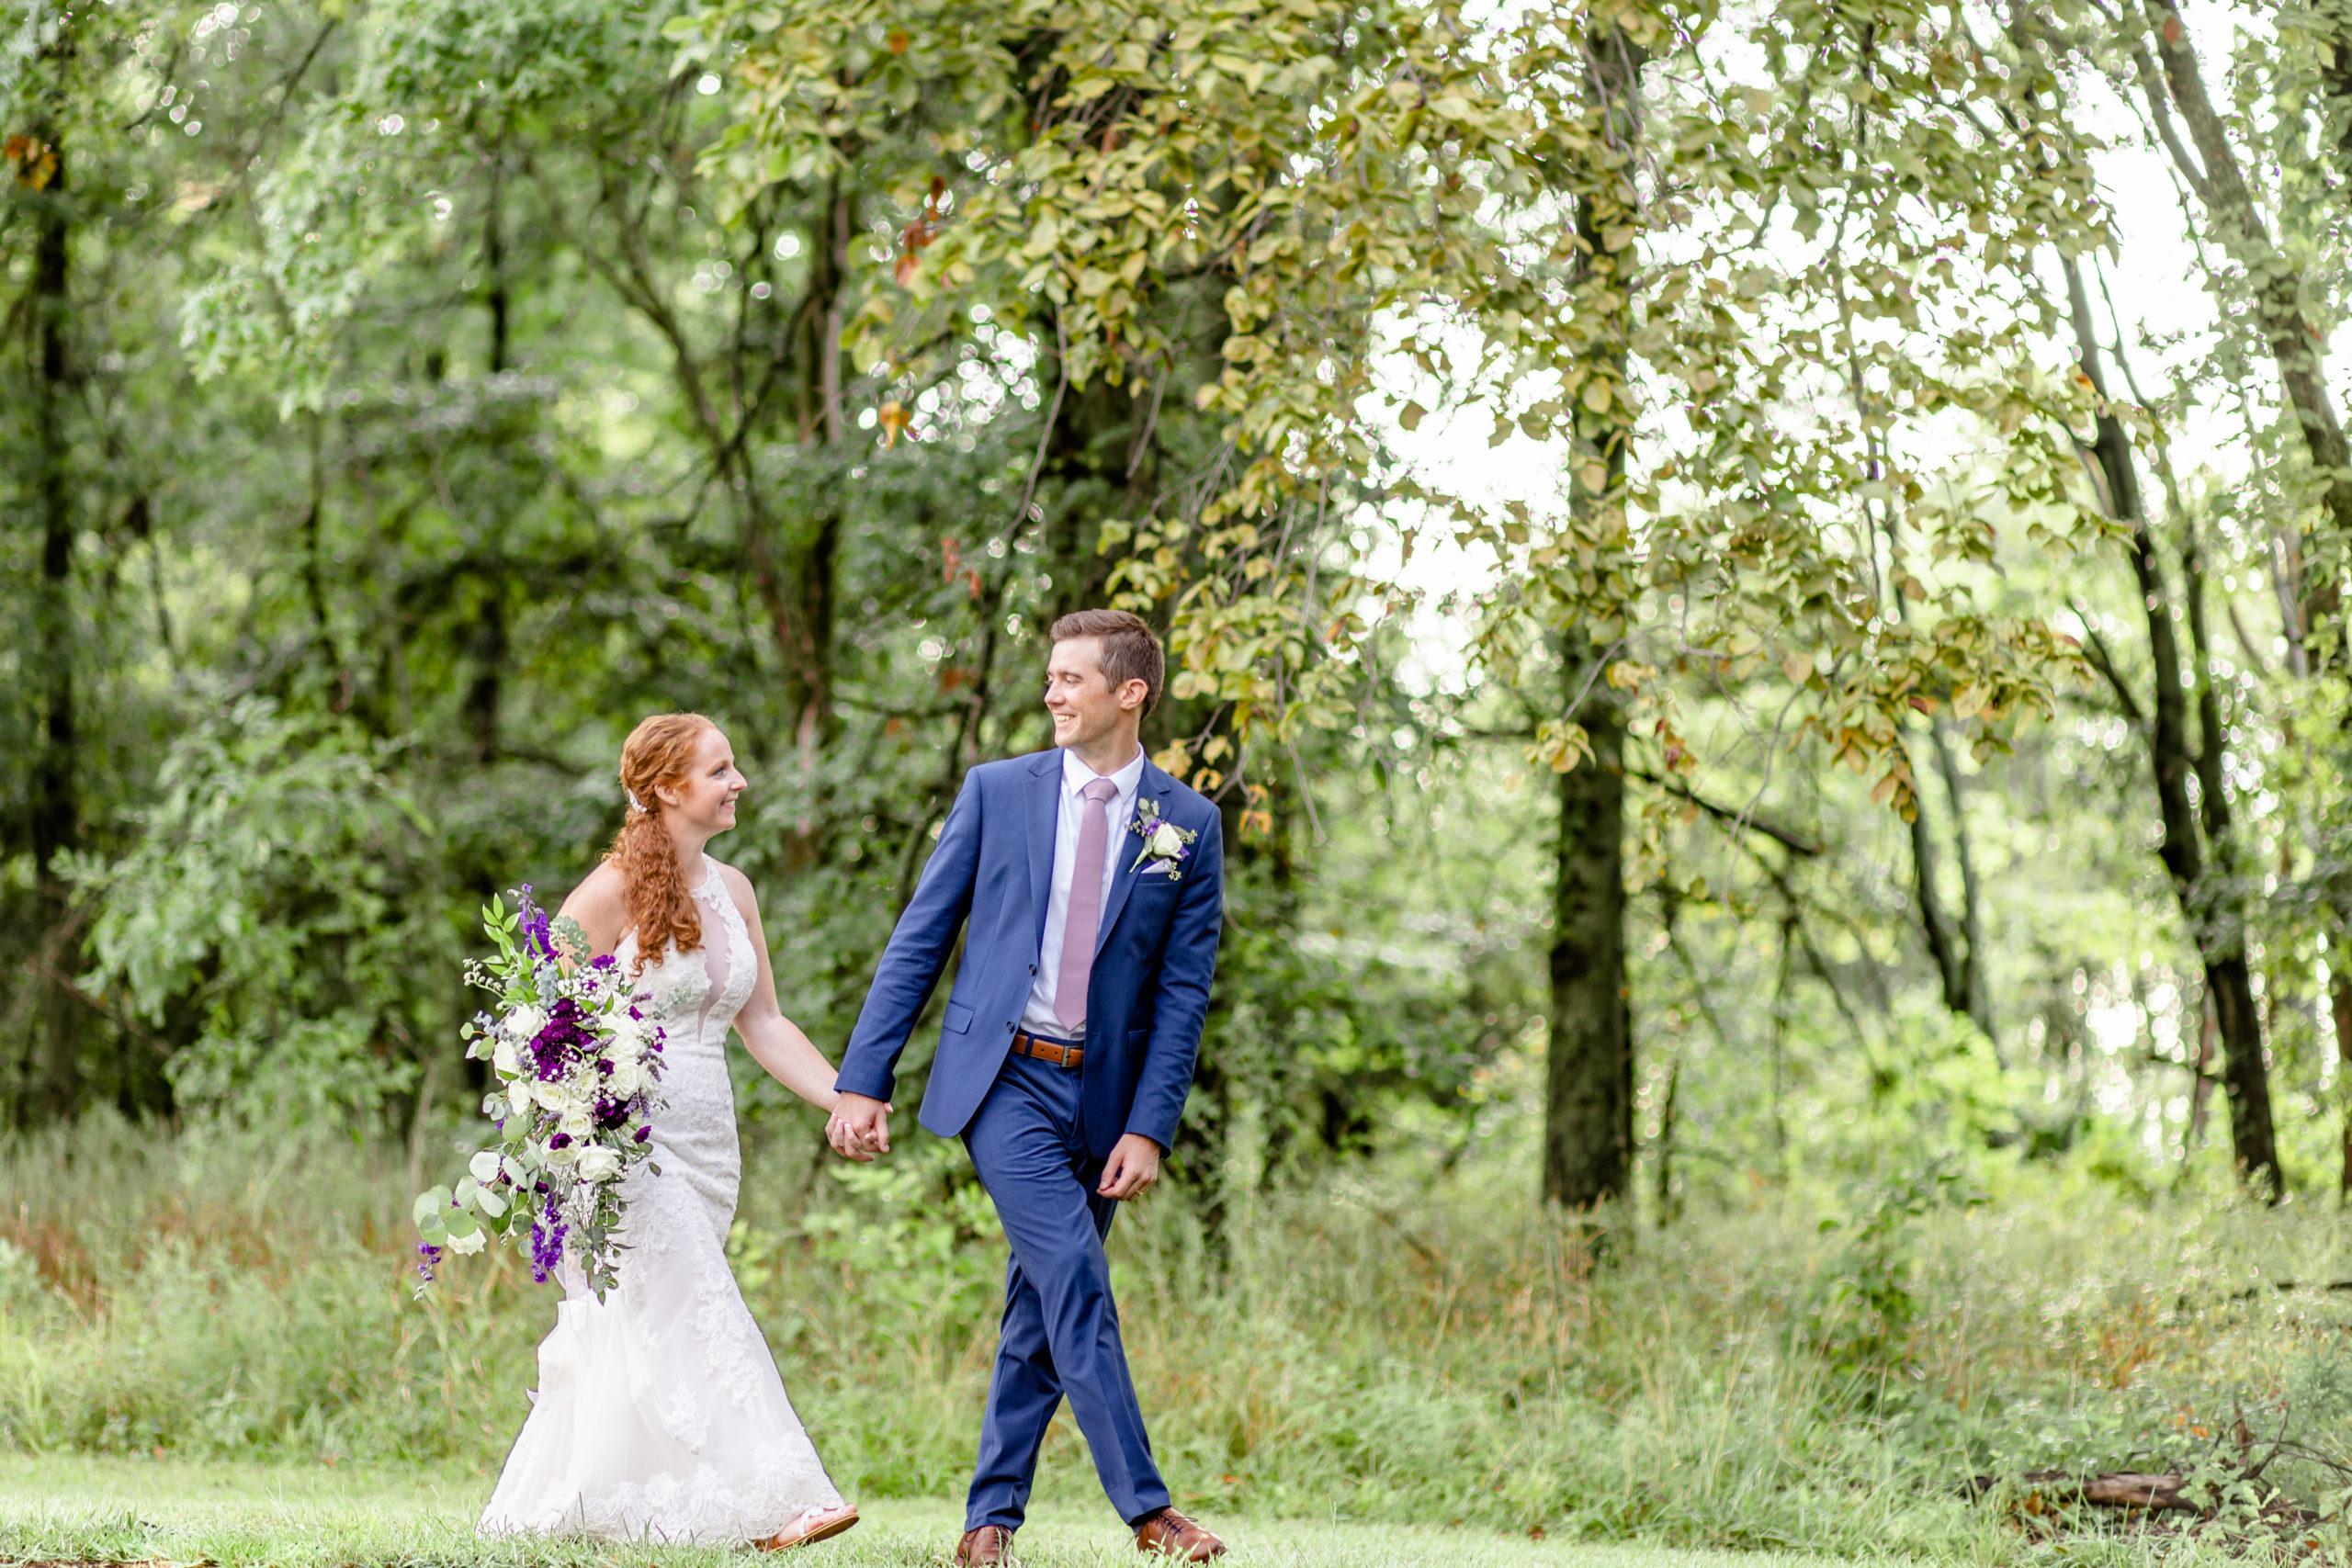 bride and groom walking, lakeside wedding, woodland wedding, southern illinois wedding photography, blue and purple wedding, white lace wedding dress, purple wedding bouquet